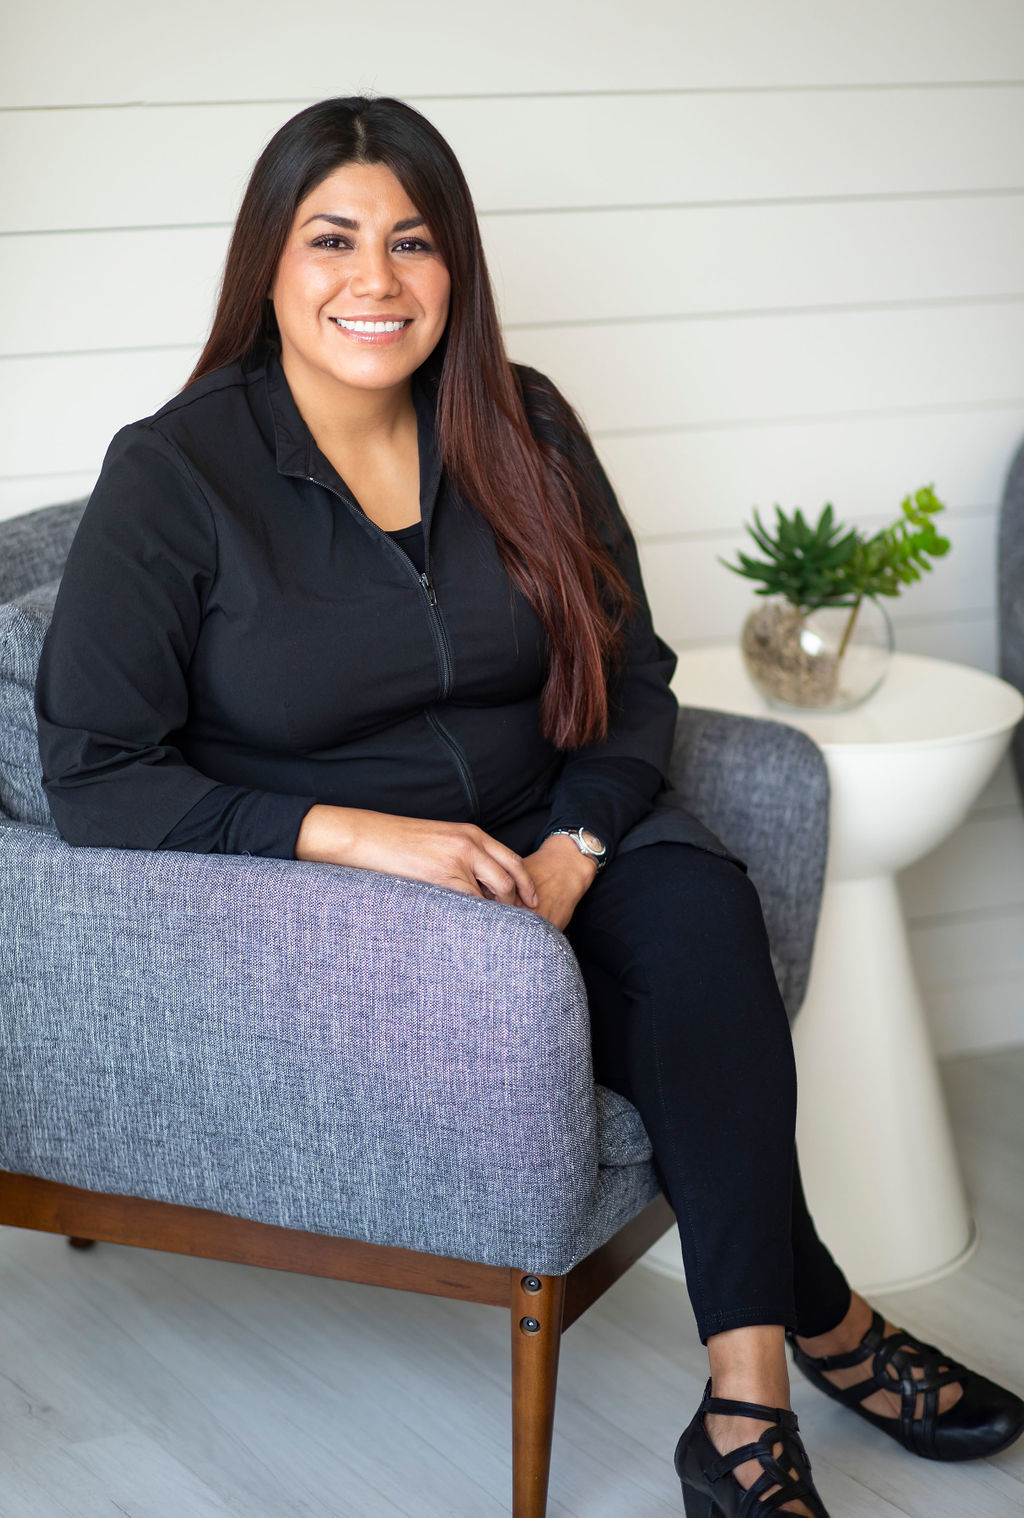 Lizeth Cheron, Patient Care Coordinator